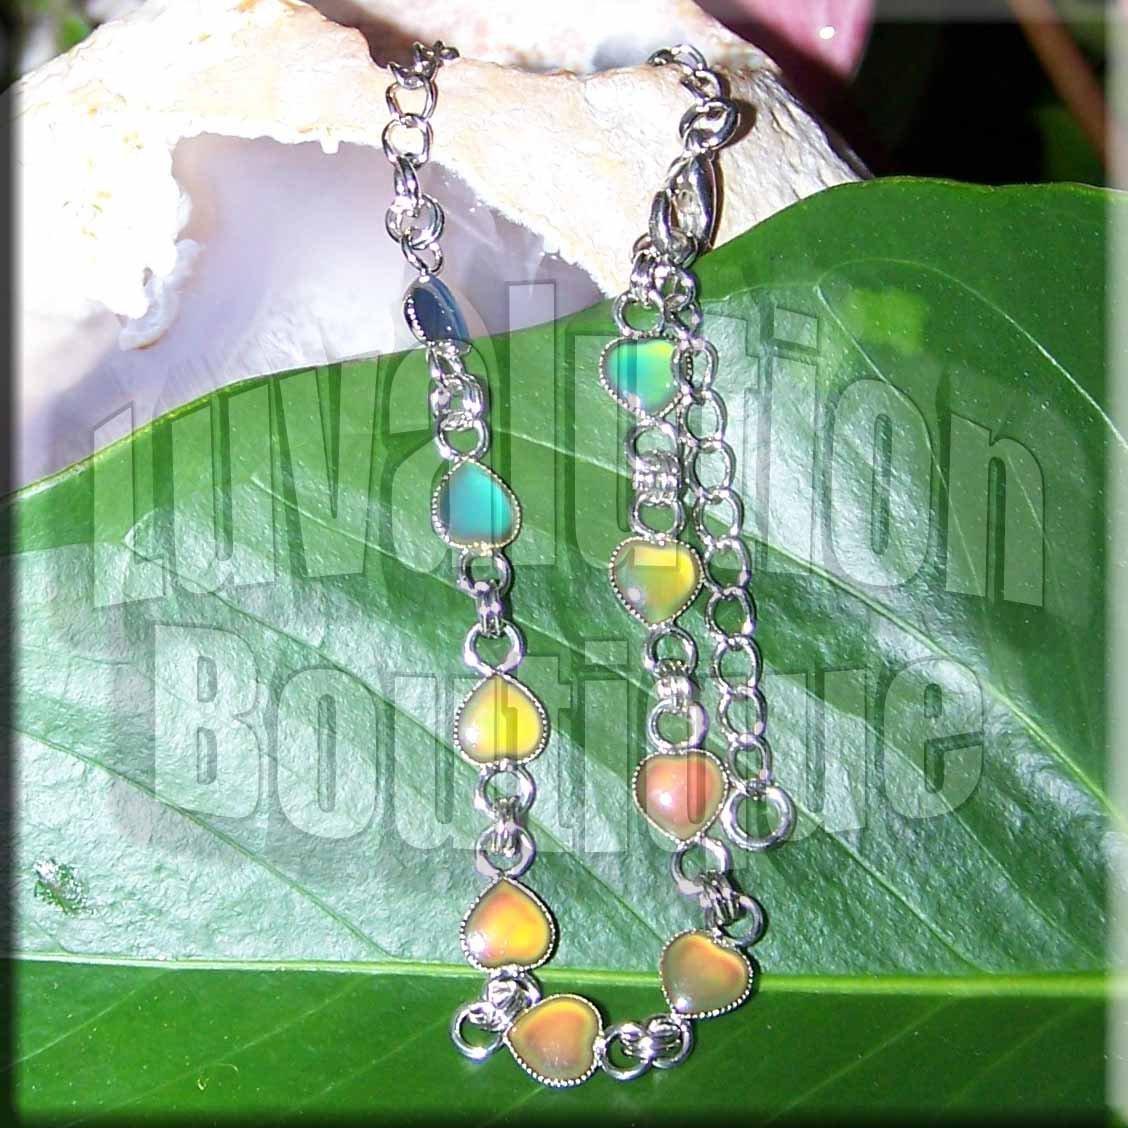 Mood Bracelet Heart Charms Link Chain Color Change Chart Retro Chic Fashion Adjustable